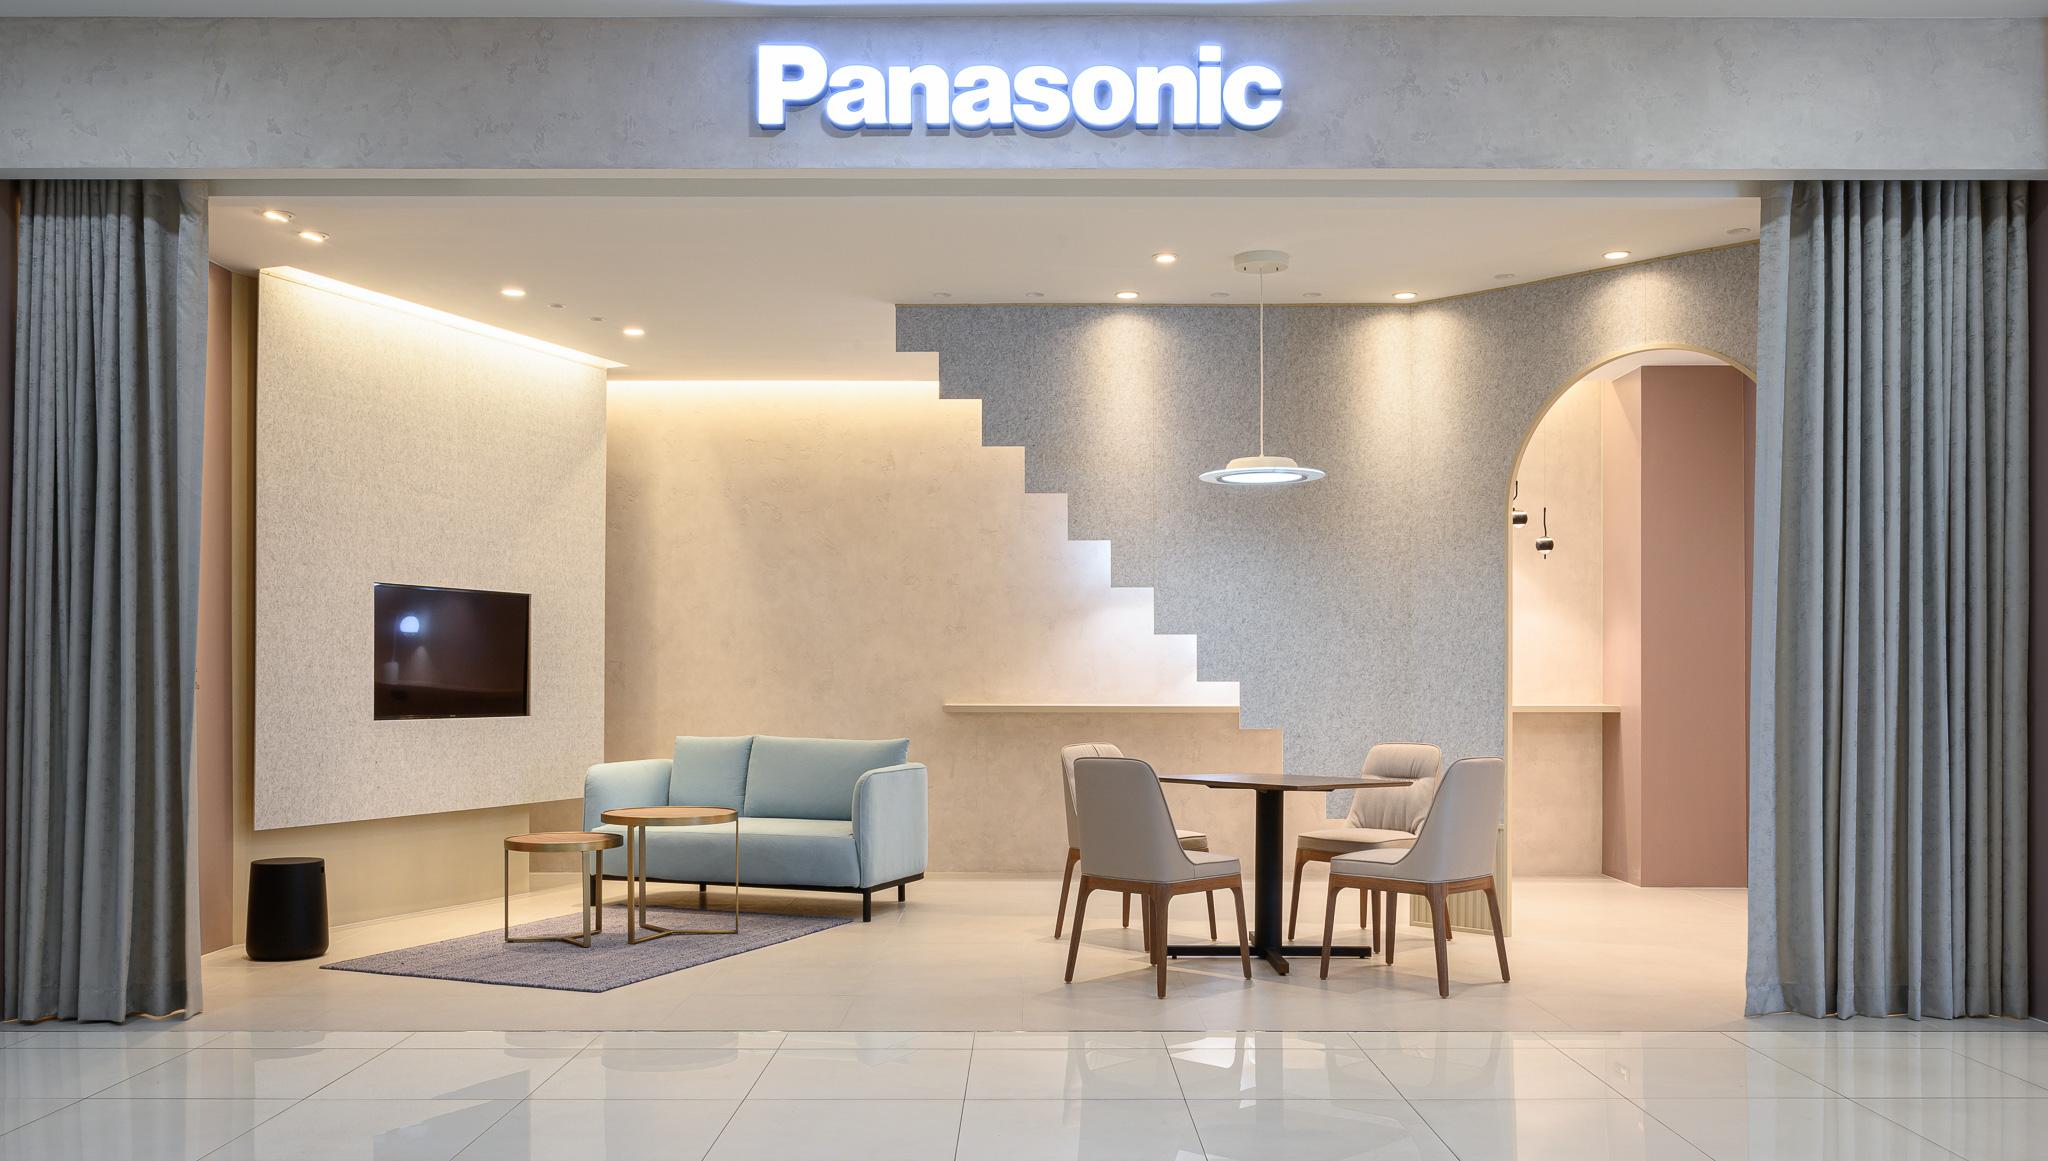 Panasonic Boonthavorn